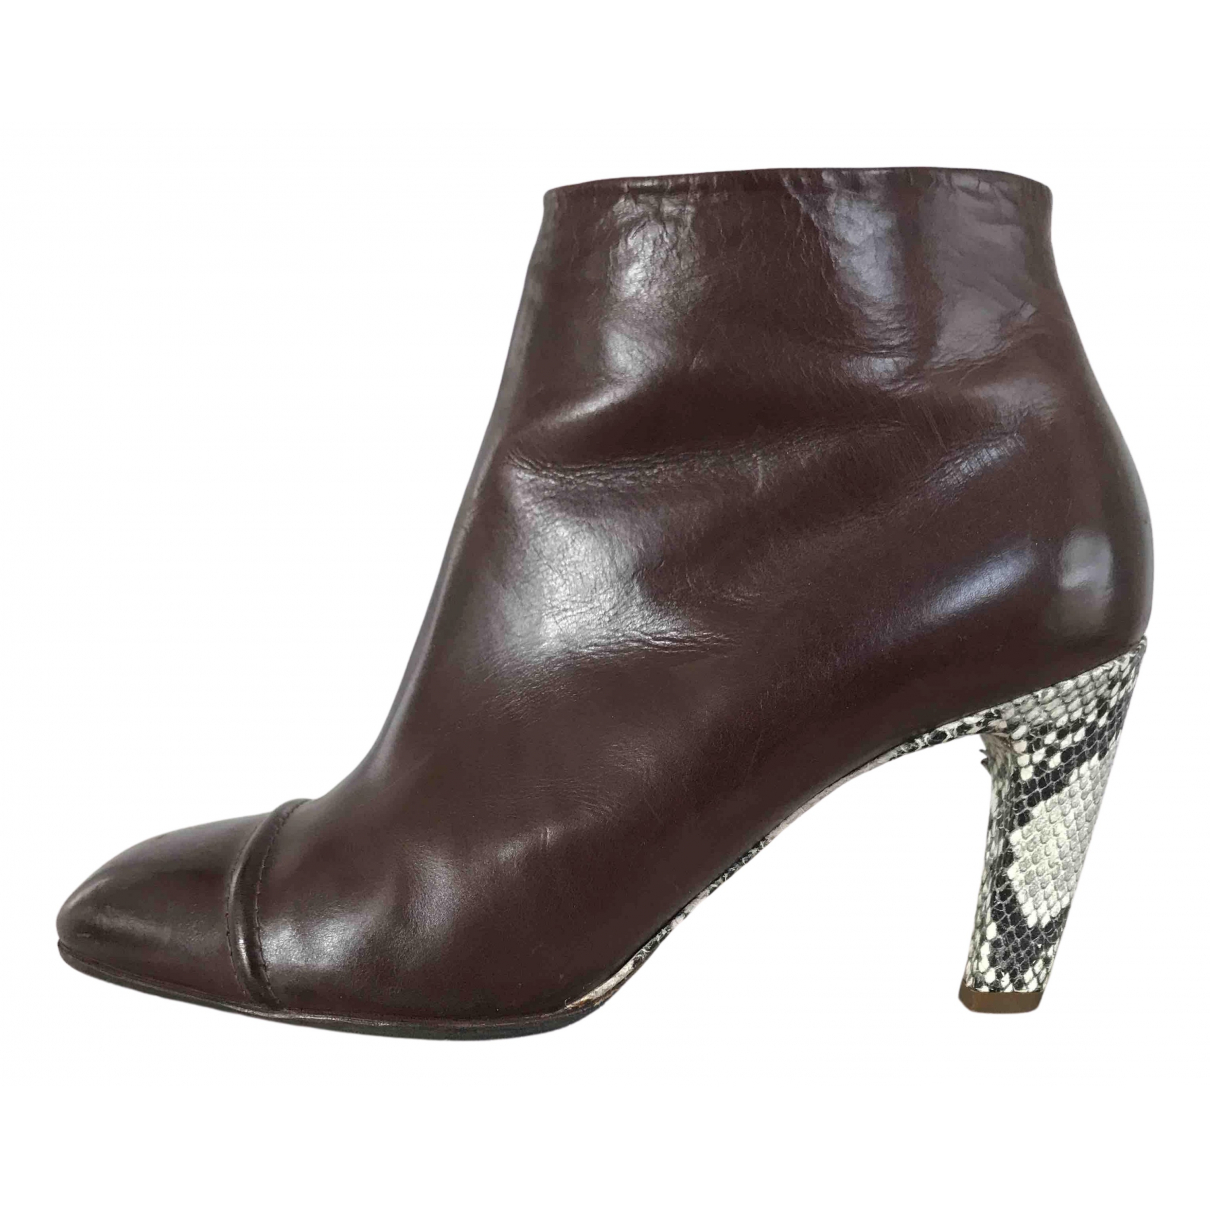 Dries Van Noten - Boots   pour femme en cuir - marron